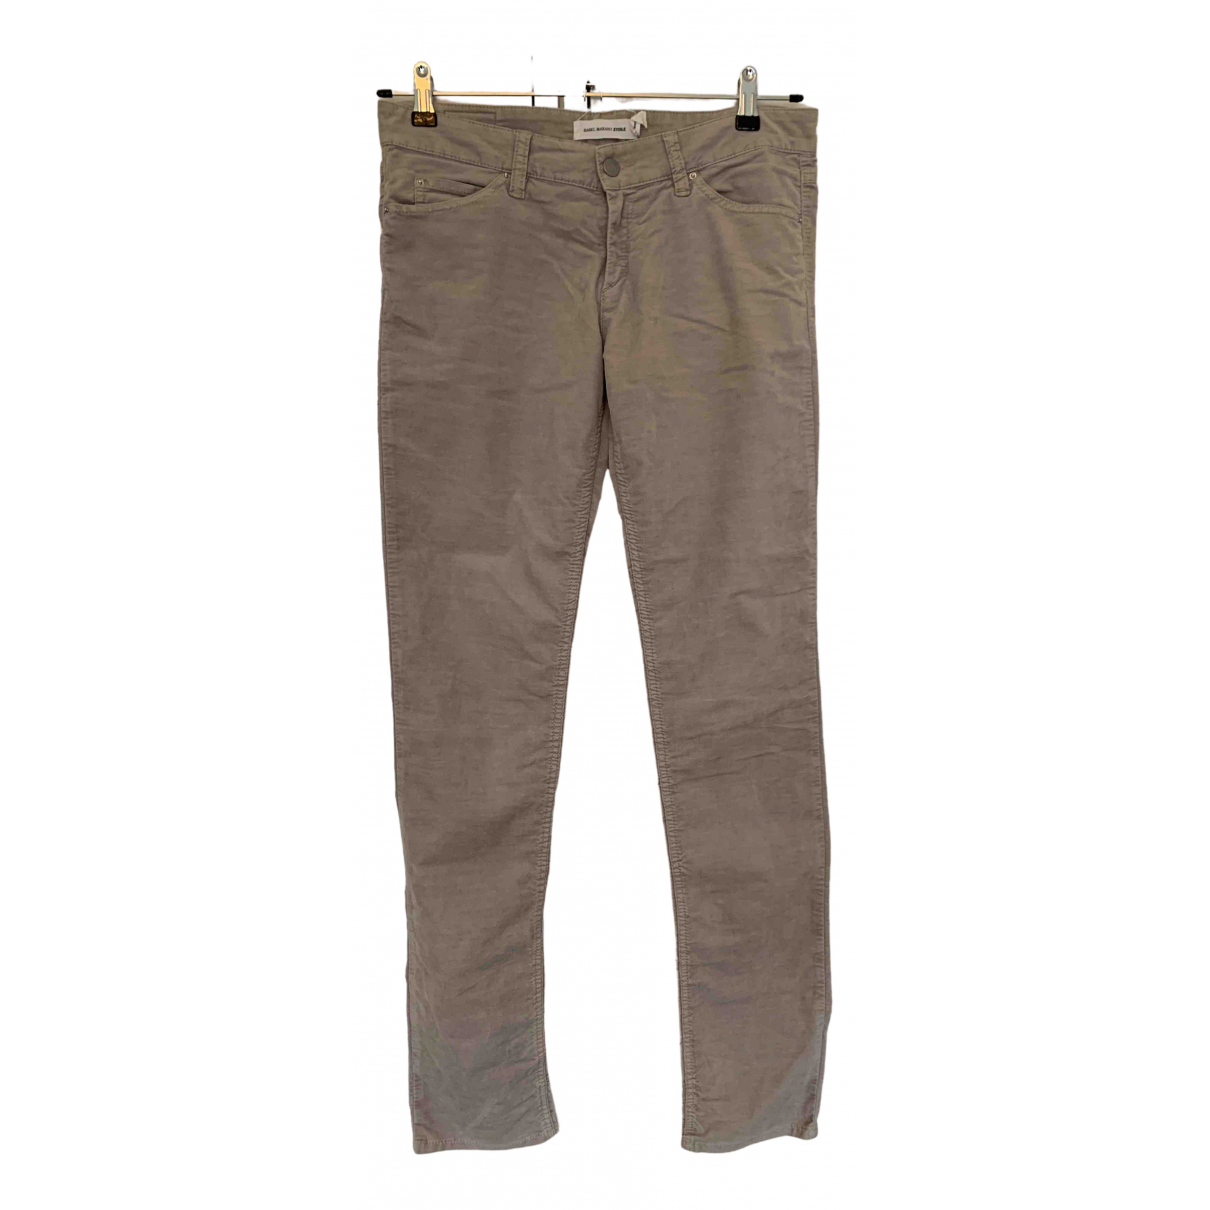 Isabel Marant Etoile N Purple Cotton Trousers for Women 40 FR